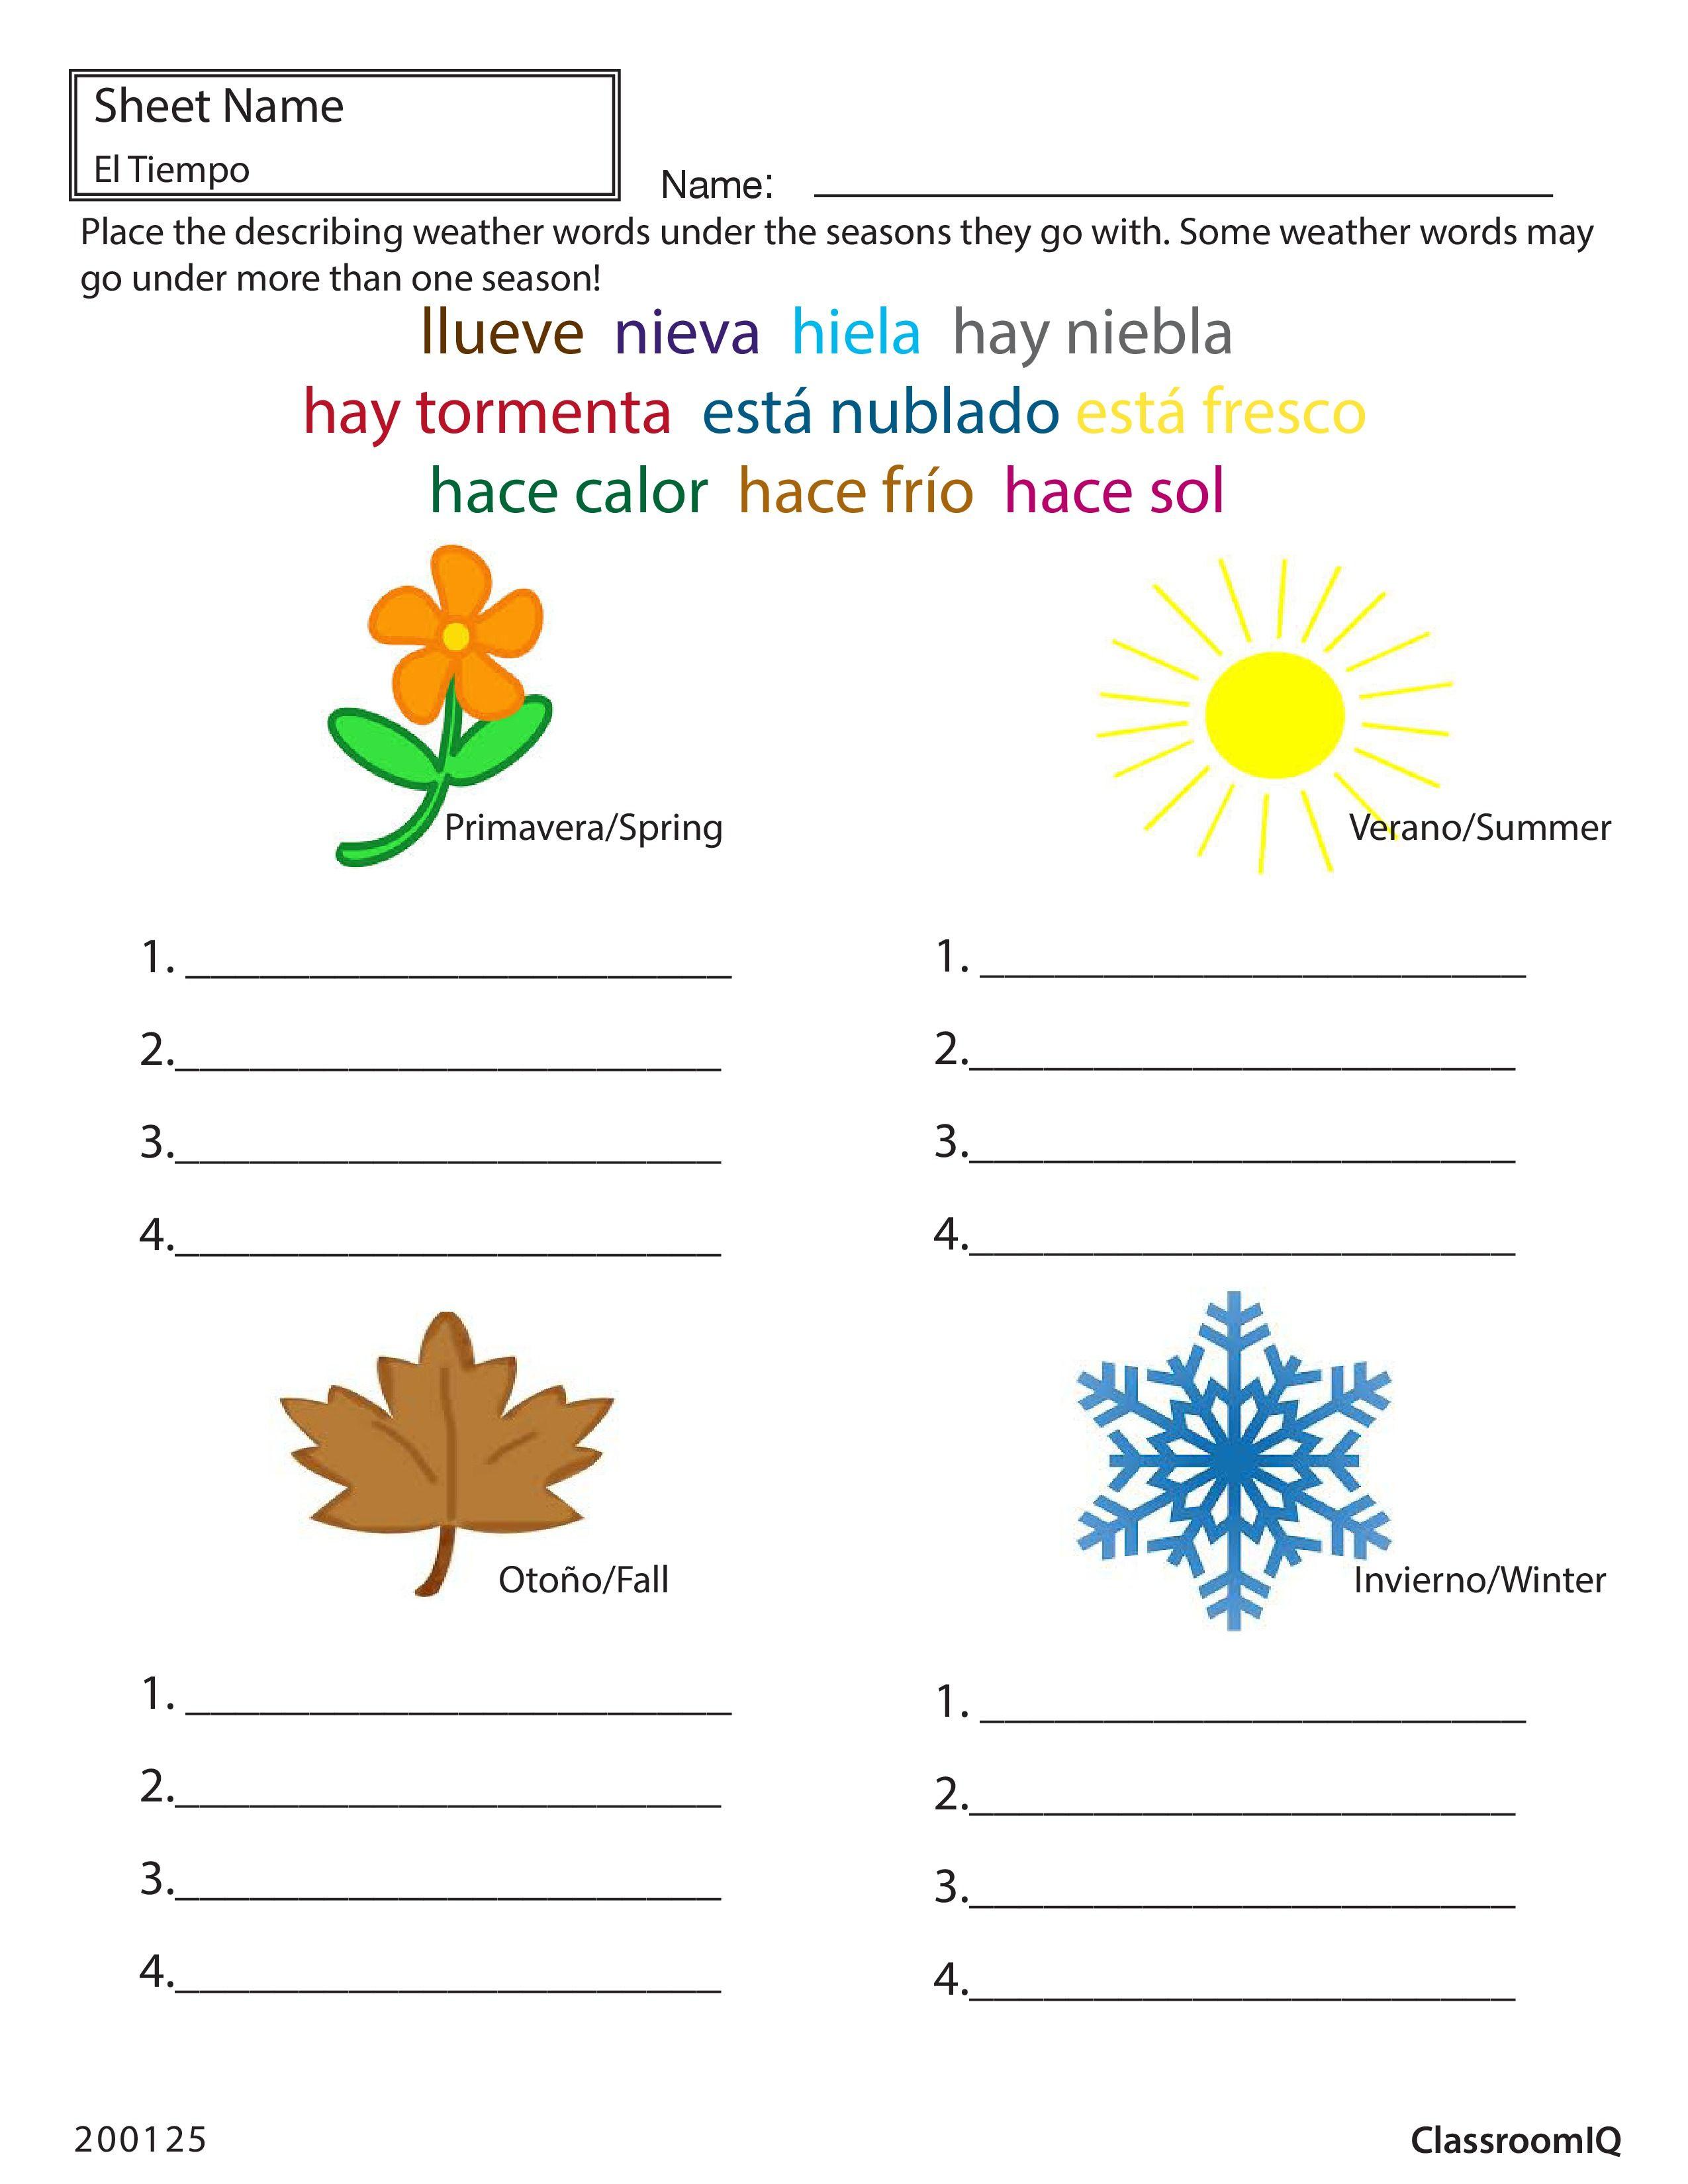 Spanish Worksheets // Level 1 [ 3300 x 2550 Pixel ]